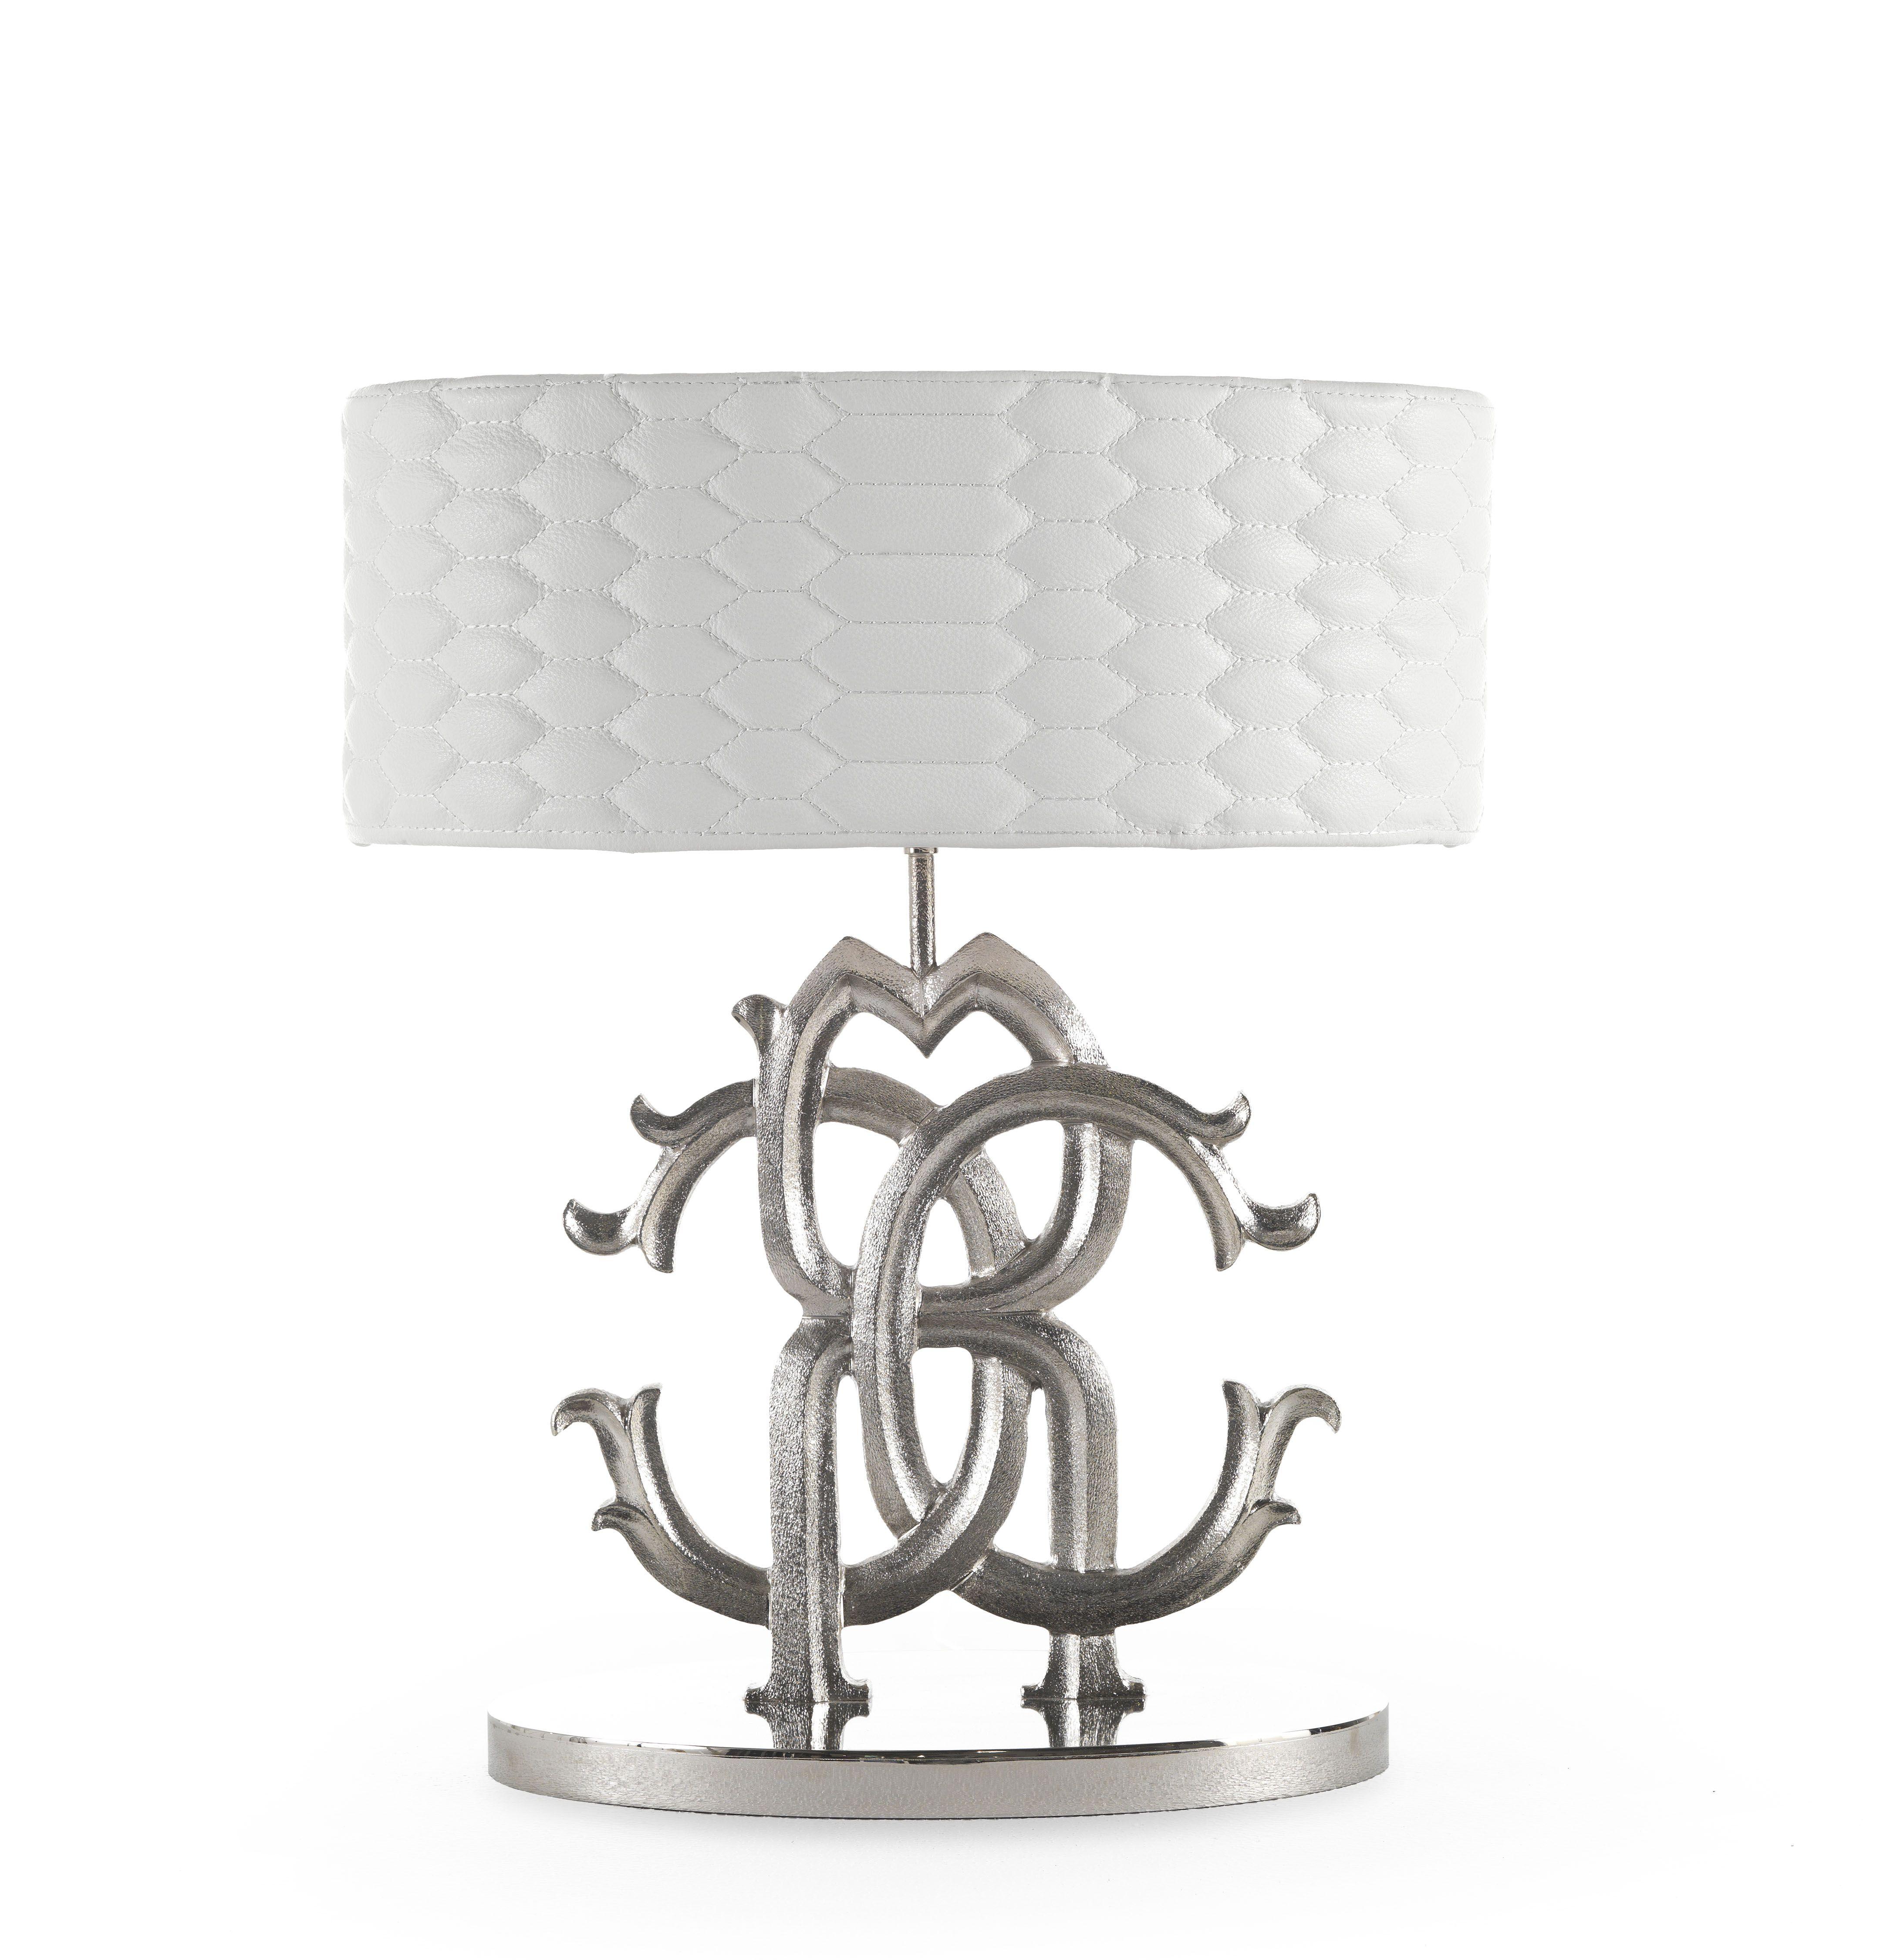 Logo Table Lamp Roberto Cavalli Home Robertocavallihome Homeinteriors Lamp Robertocavallihomeinteriors Kingsofchelsea Interiors With Images Lamp Design Lamp Design